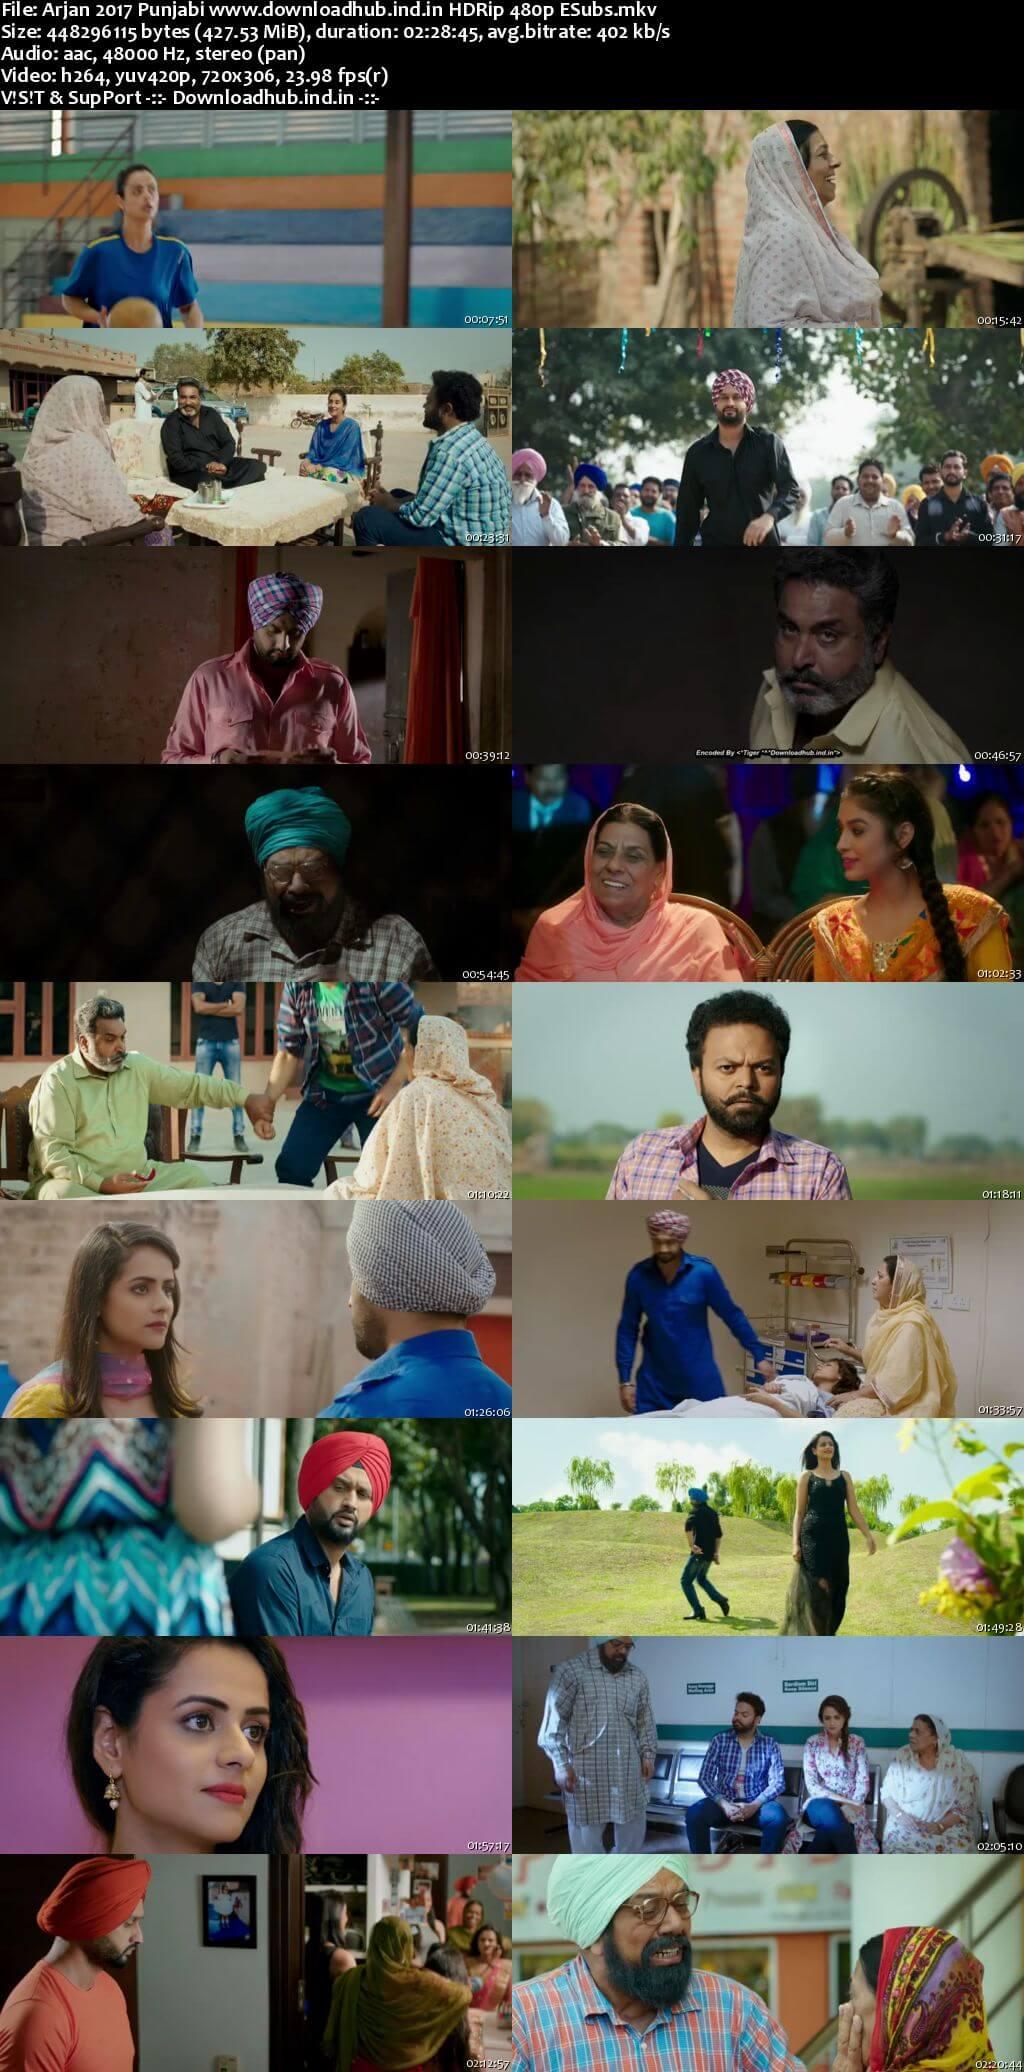 Arjan 2017 Punjabi 400MB HDRip 480p ESubs